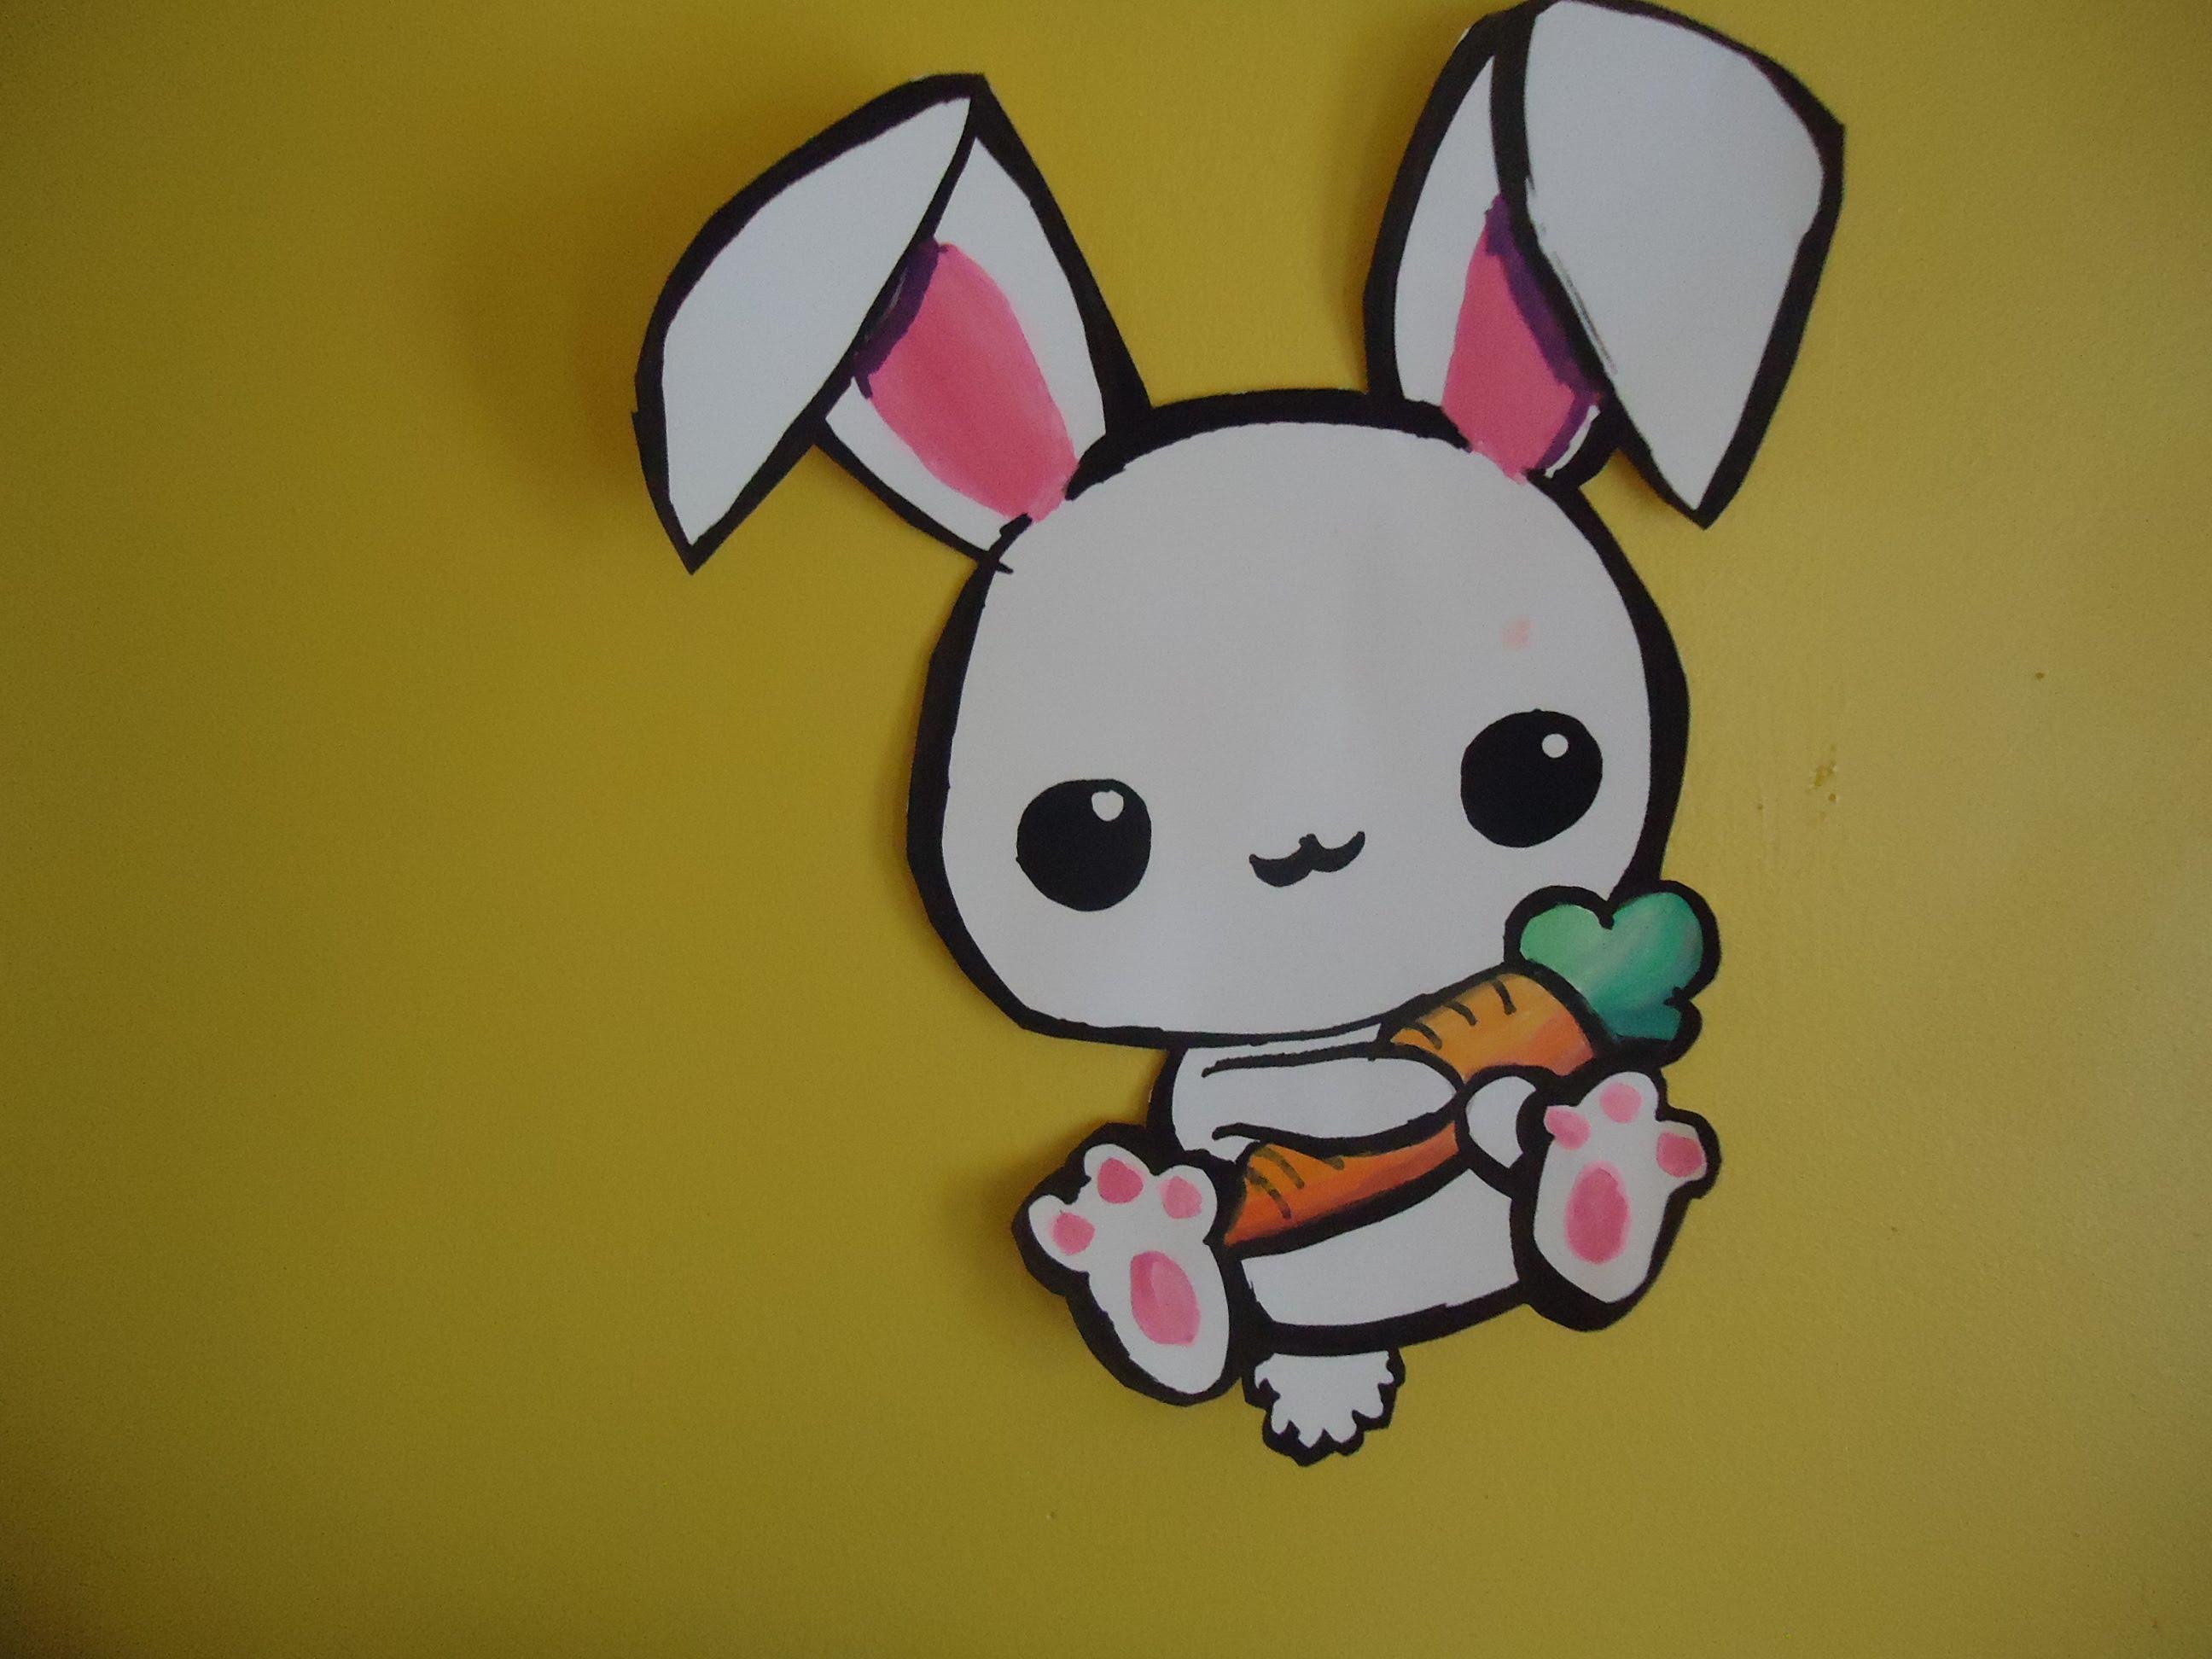 Drawn rabbit cute Draw to chan (Bunny) kawaii